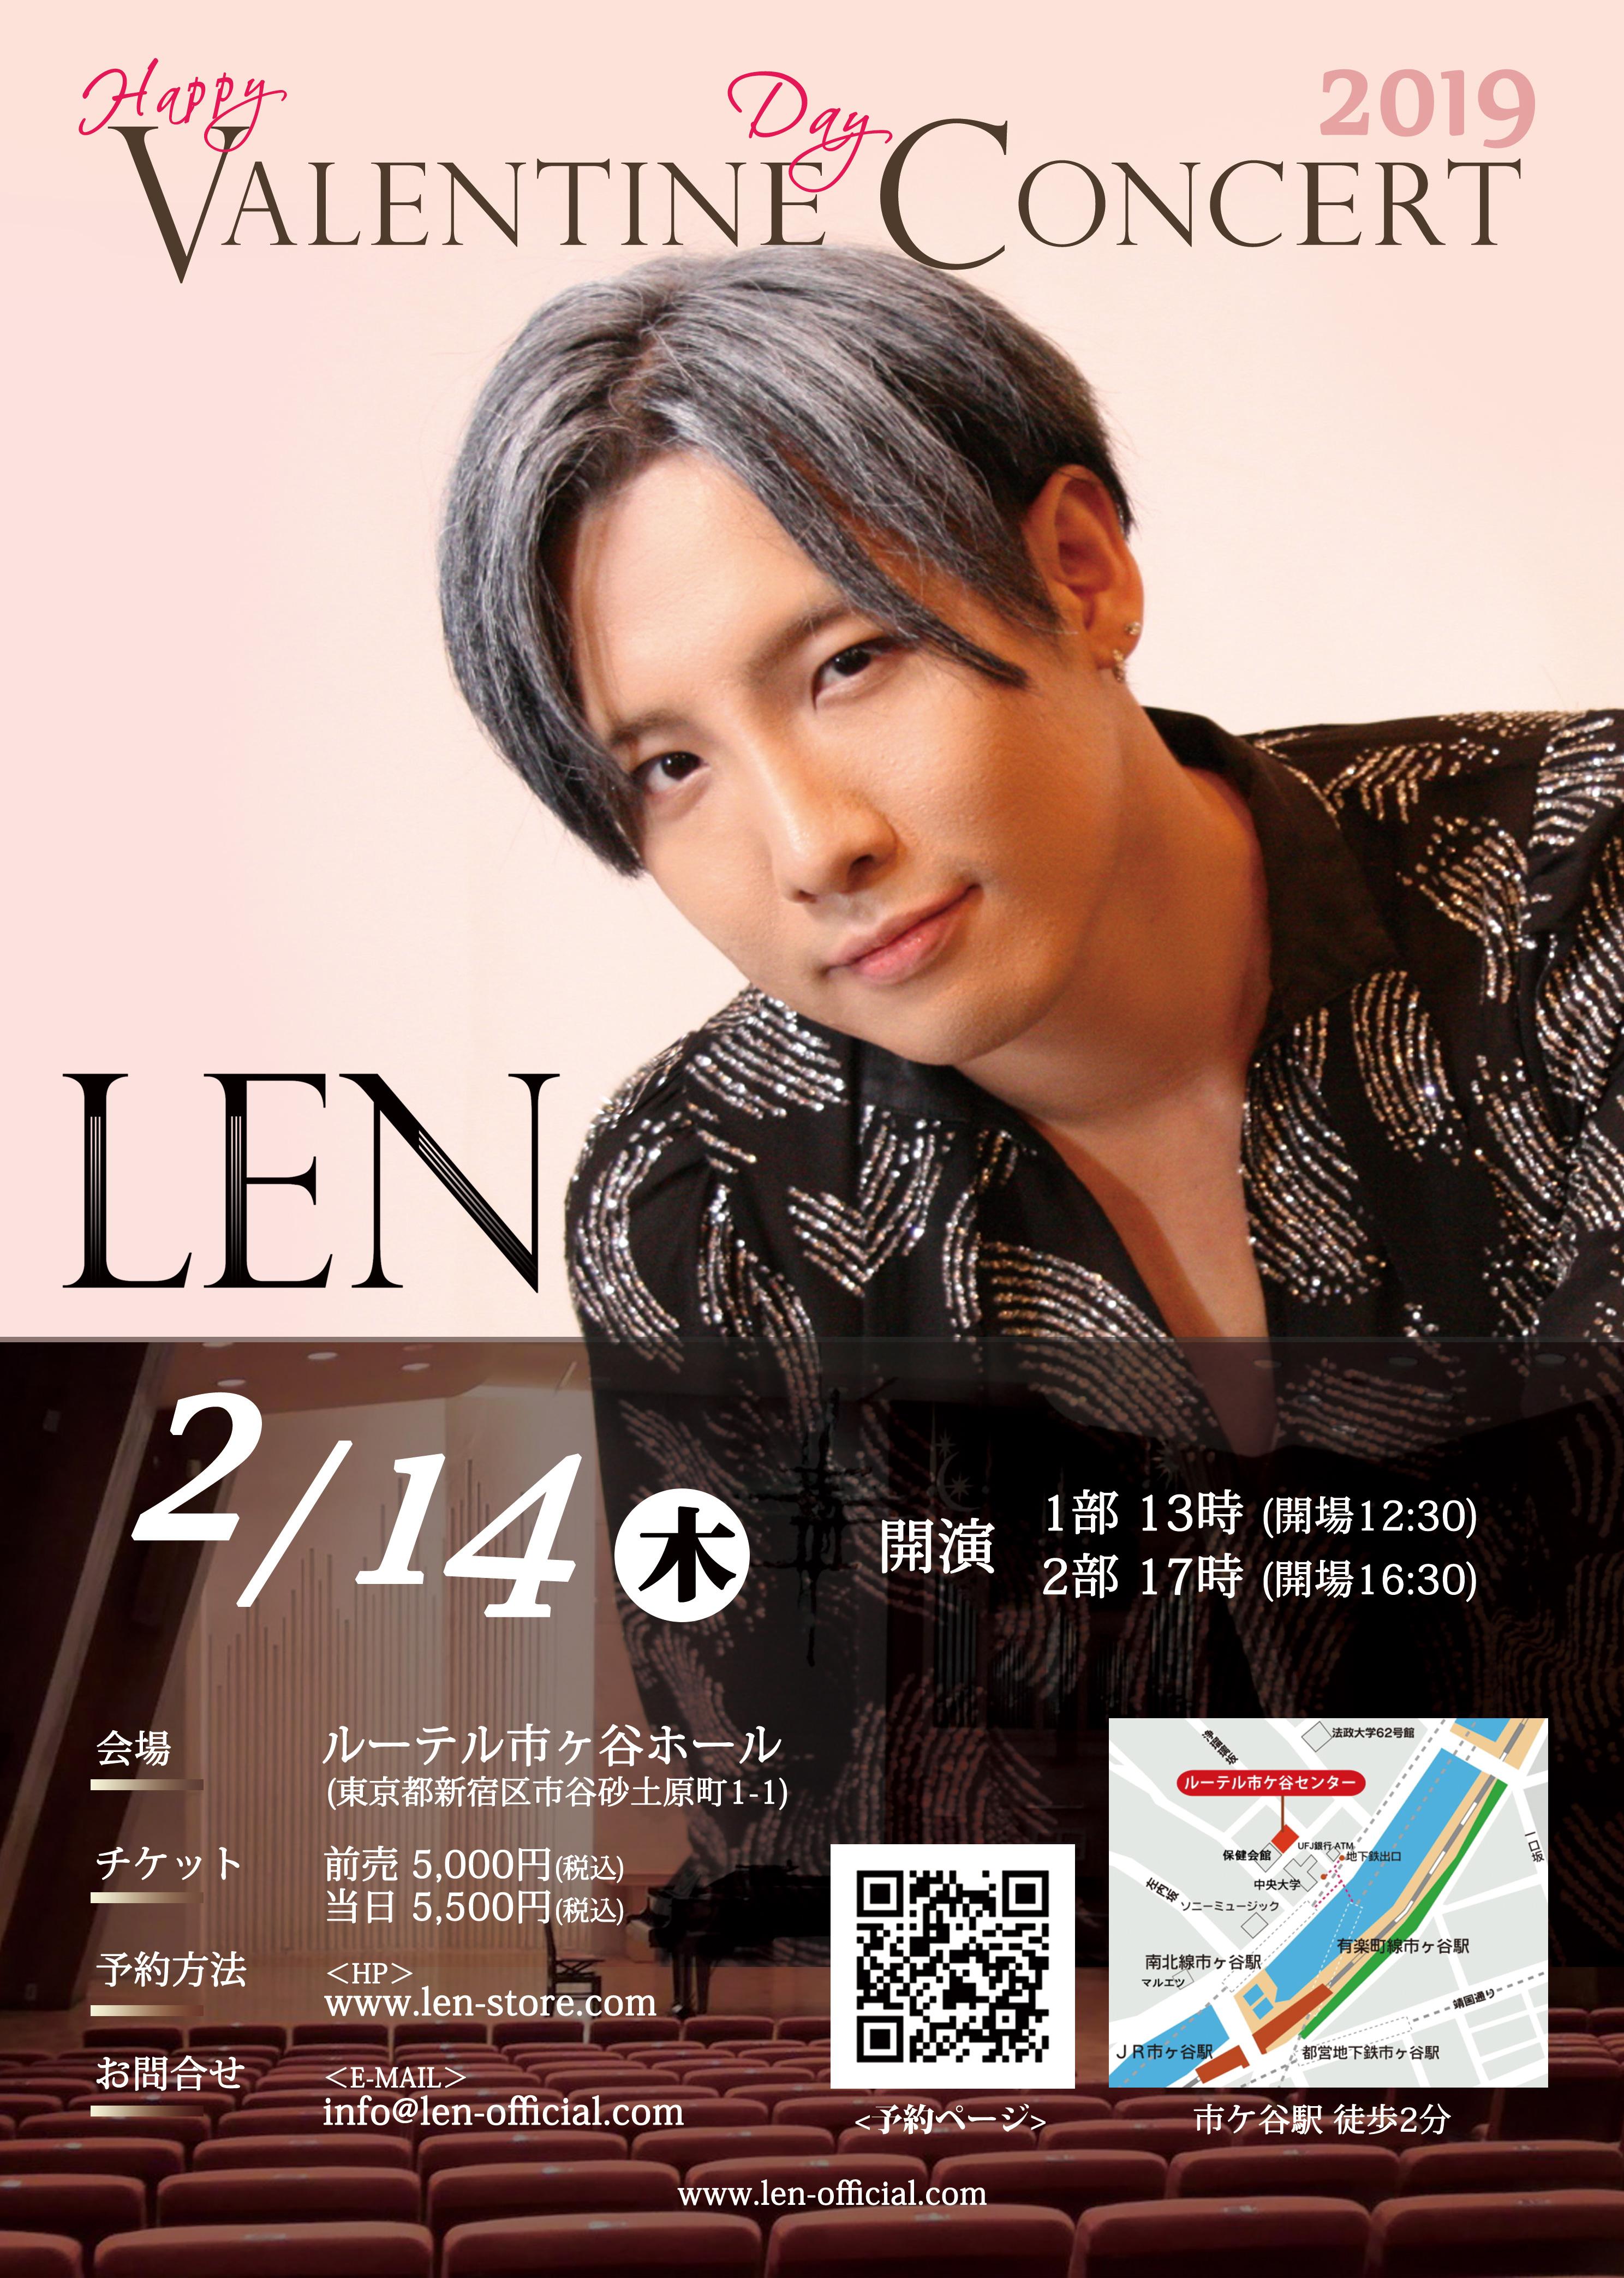 20190214_Valentine_Concert2019